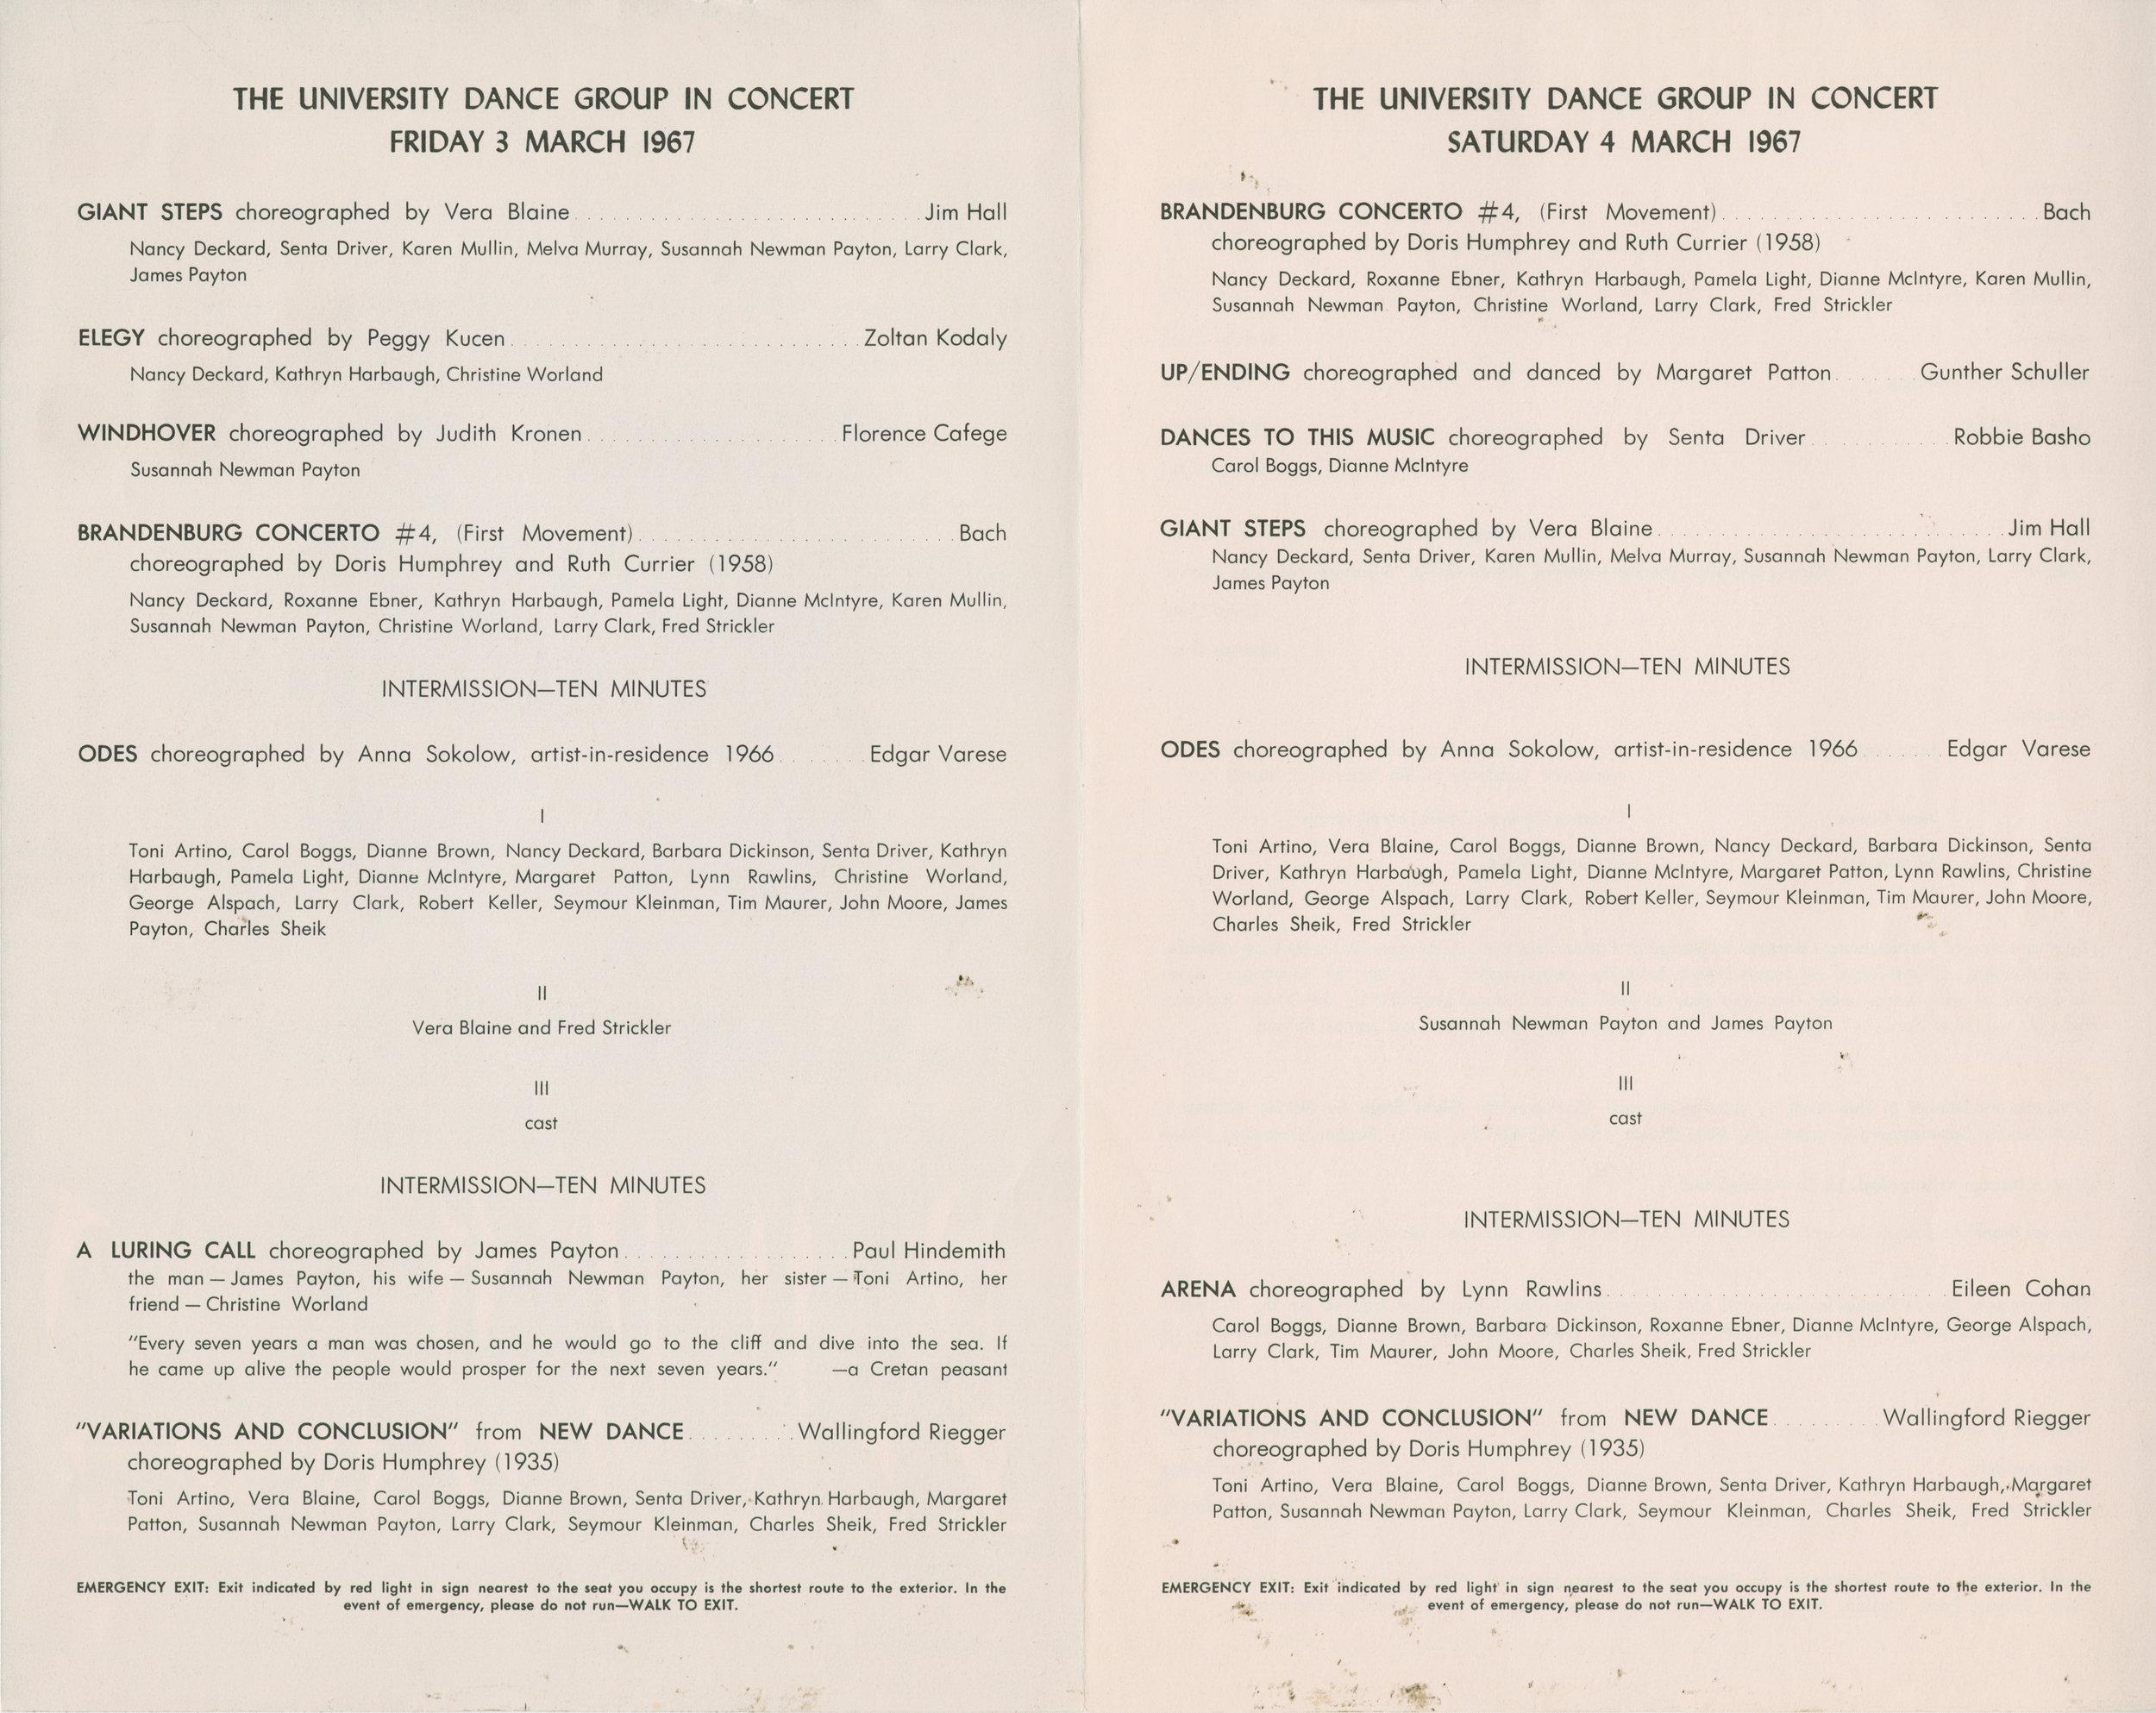 UDG_1967_DancePrograms-018-002.jpg